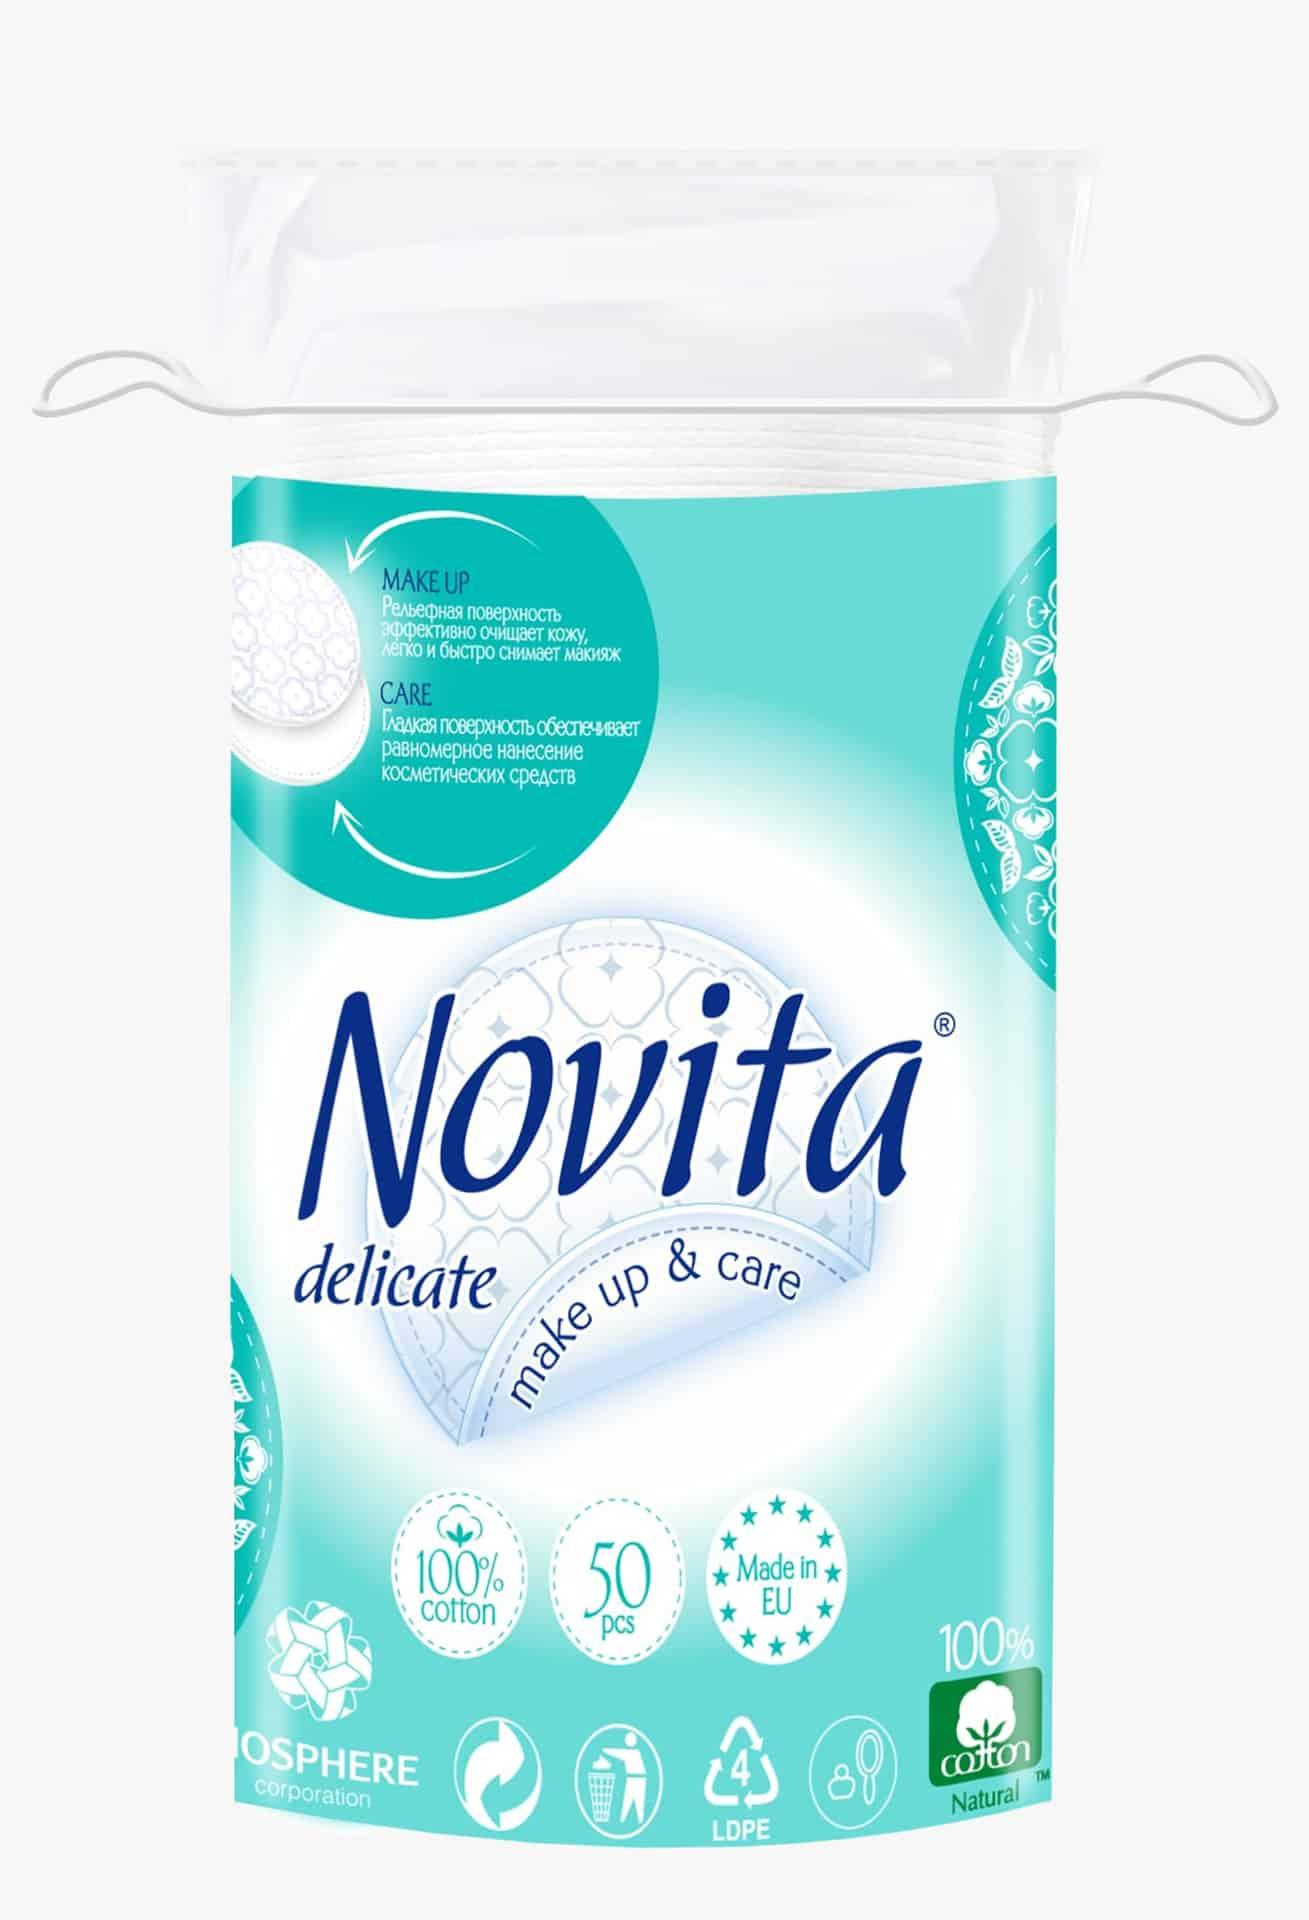 NOVITA Delicate Диски ватні косметичні, 50шт.